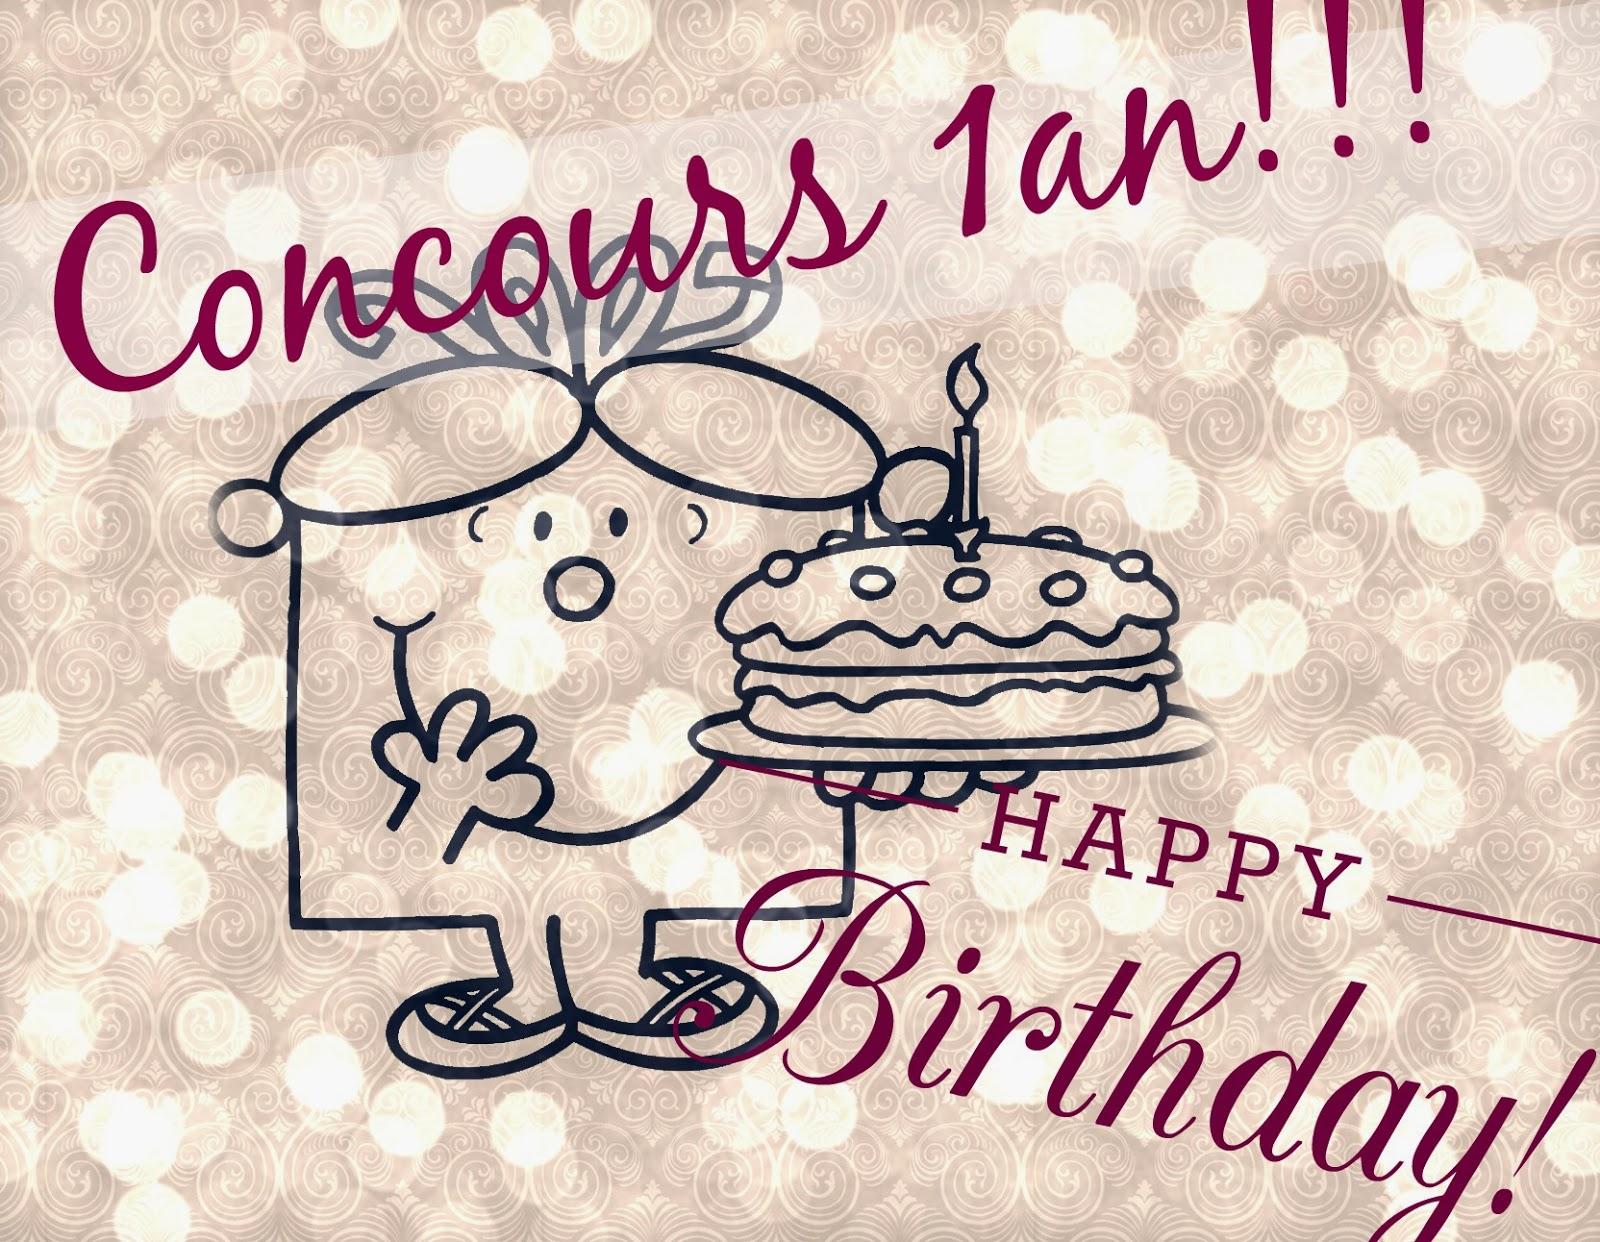 Concours des 1 an du blog - AromaZone / Etat Pur - Happy Birthday!!